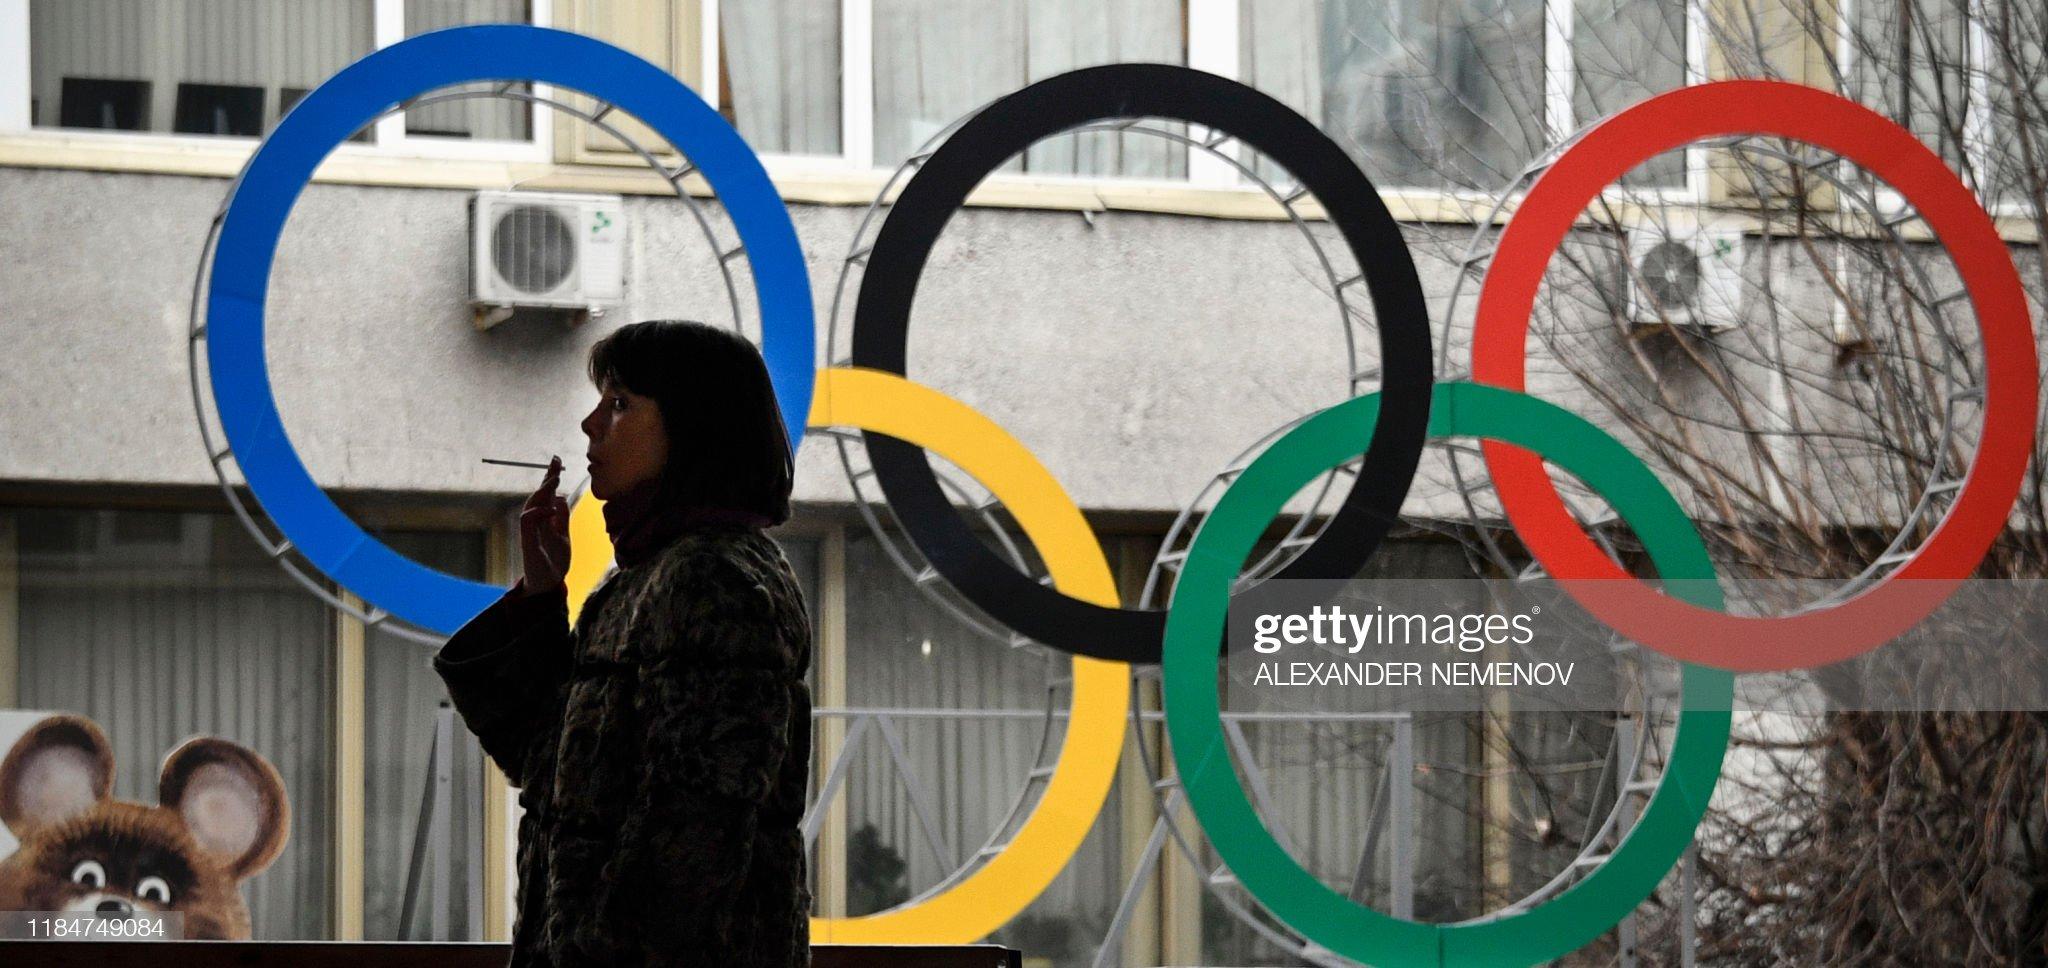 RUSSIA-DOPING-WADA-BAN-OLY-2020 : News Photo